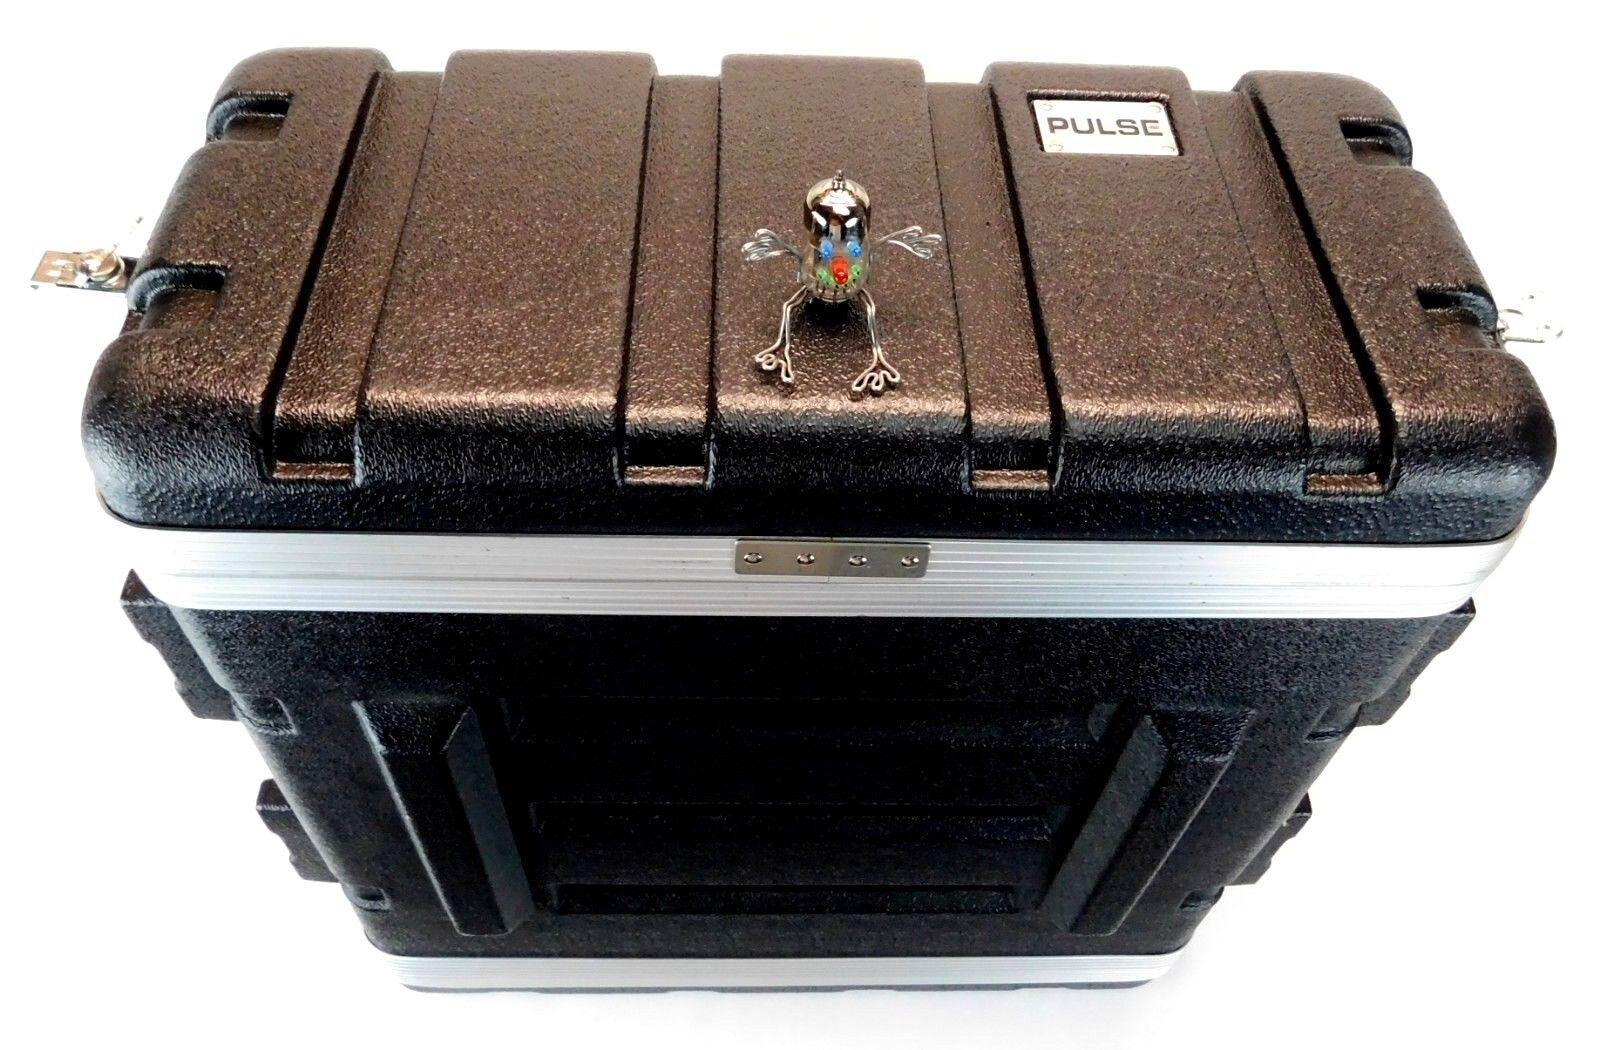 Pulse Case 4HE Professional Flightcase ABS ähnl. Gator +Guter Zustand+ Garantie